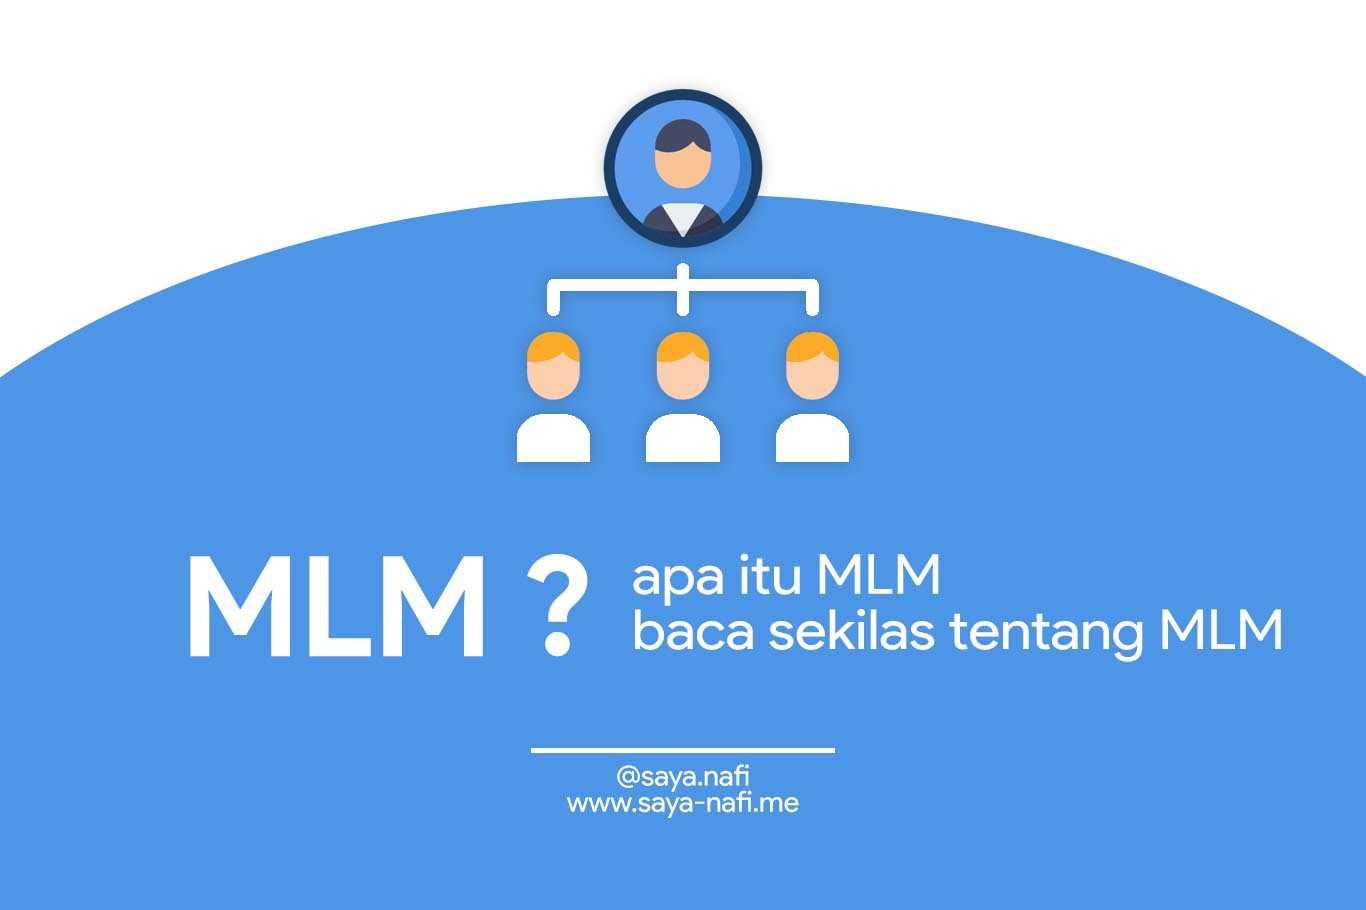 sekilas-tentang-multi-level-marketing-mlm-saya-nafi-me